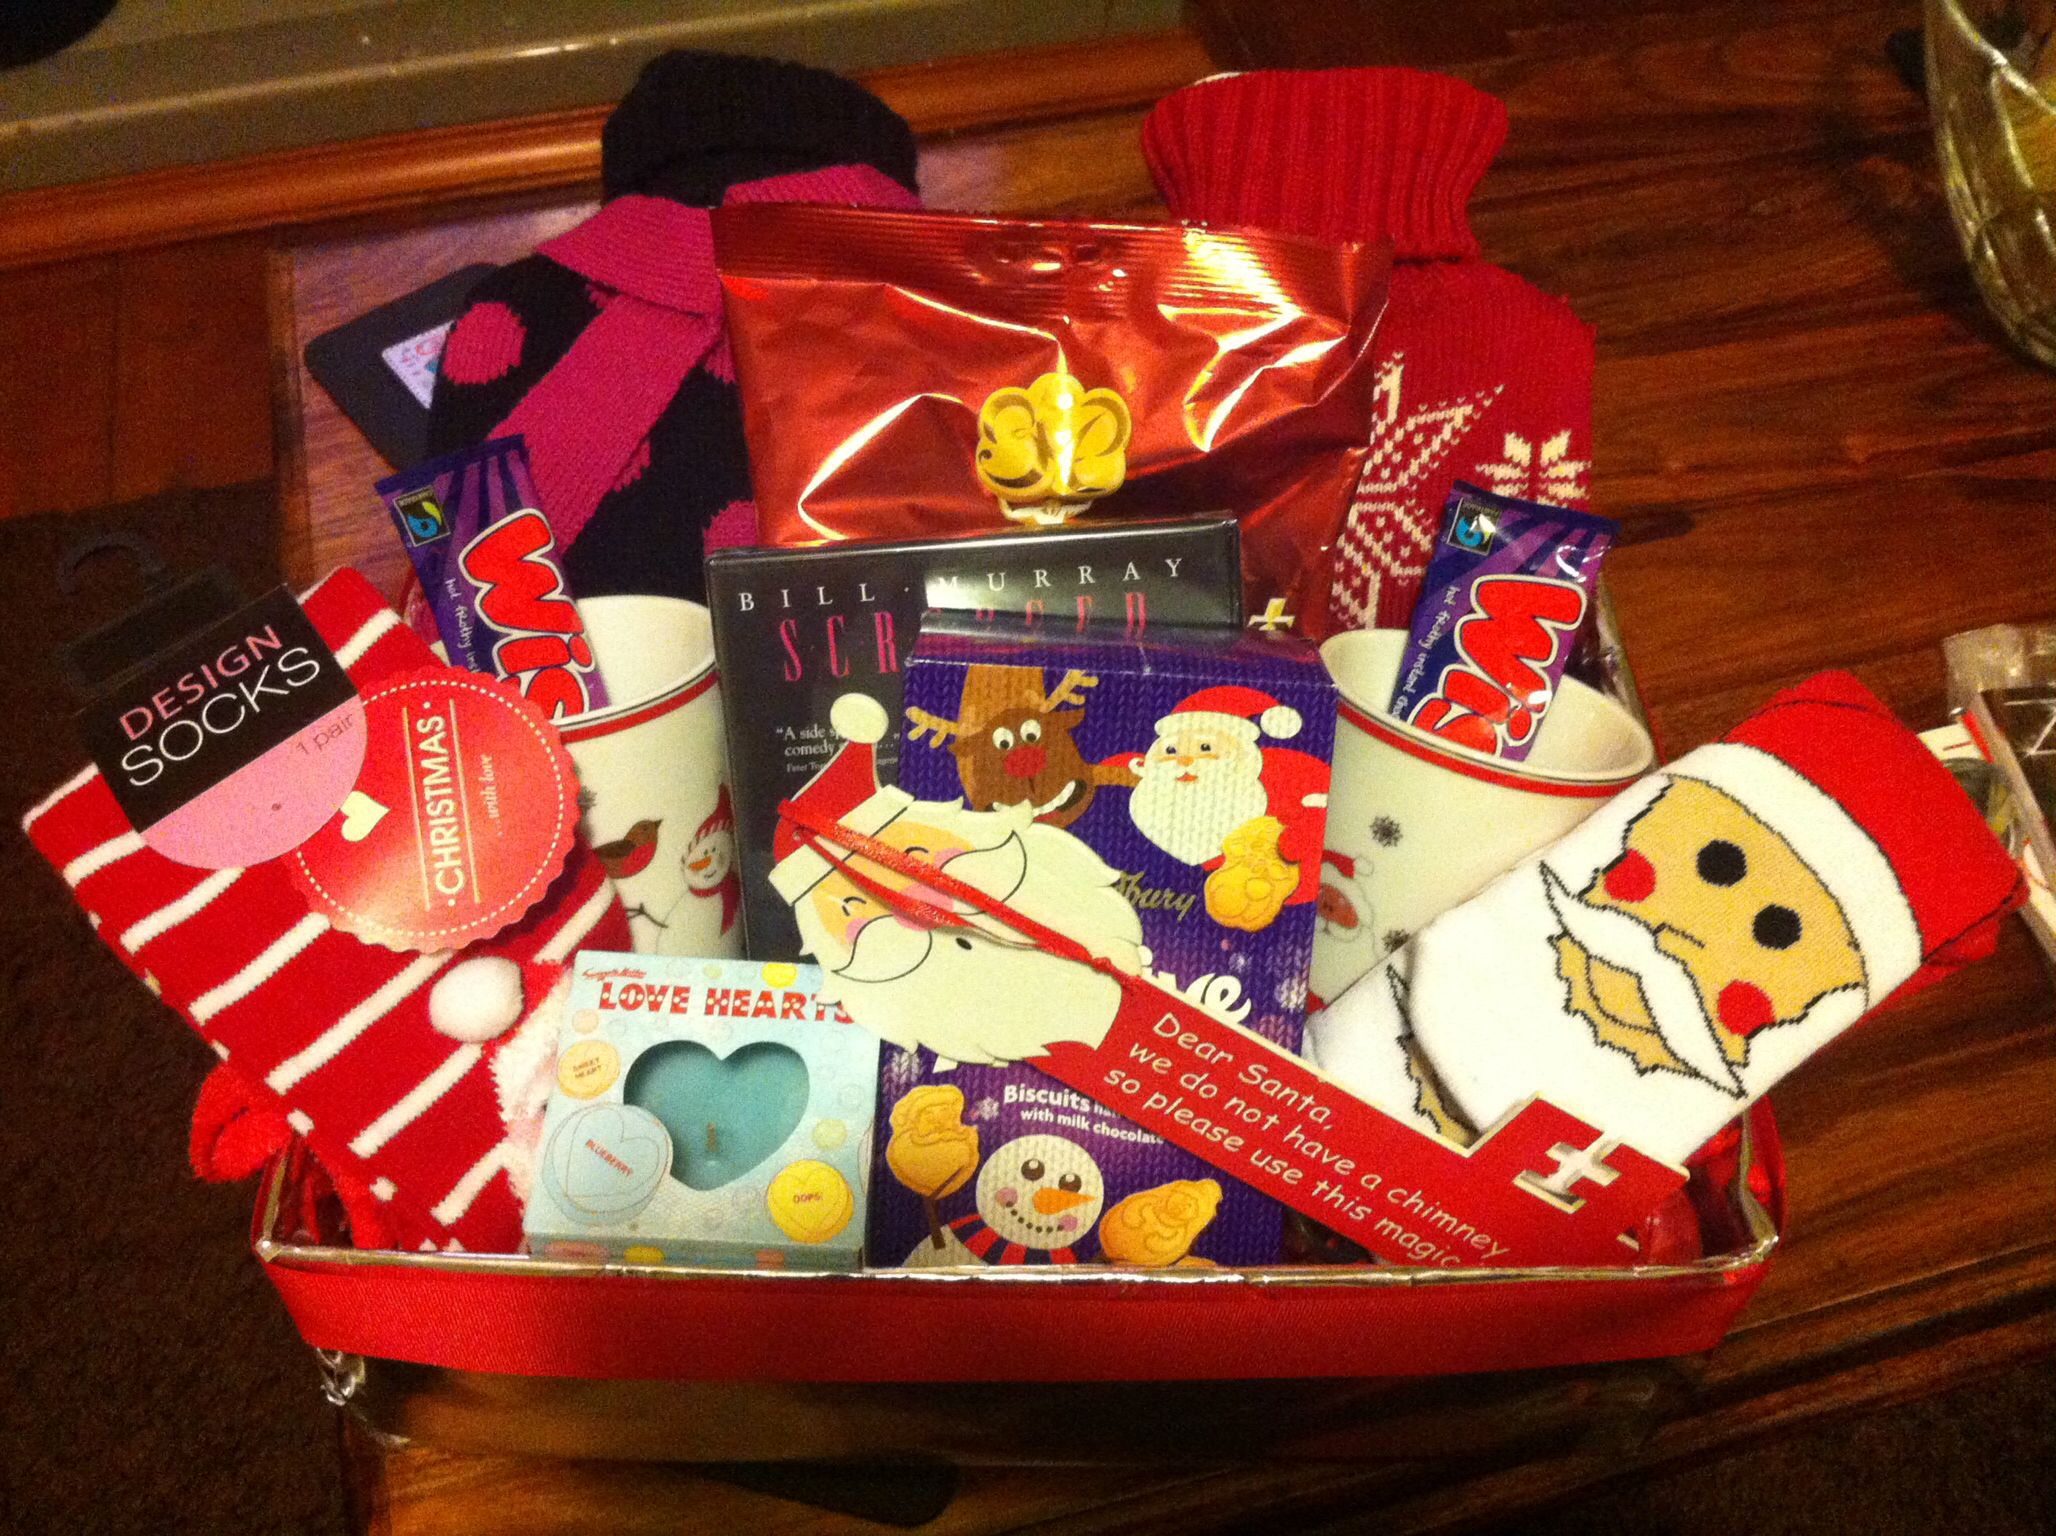 Xmas Eve Box For A Special Couple Christmas Eve Box Christmas Gifts For Friends Christmas Couple